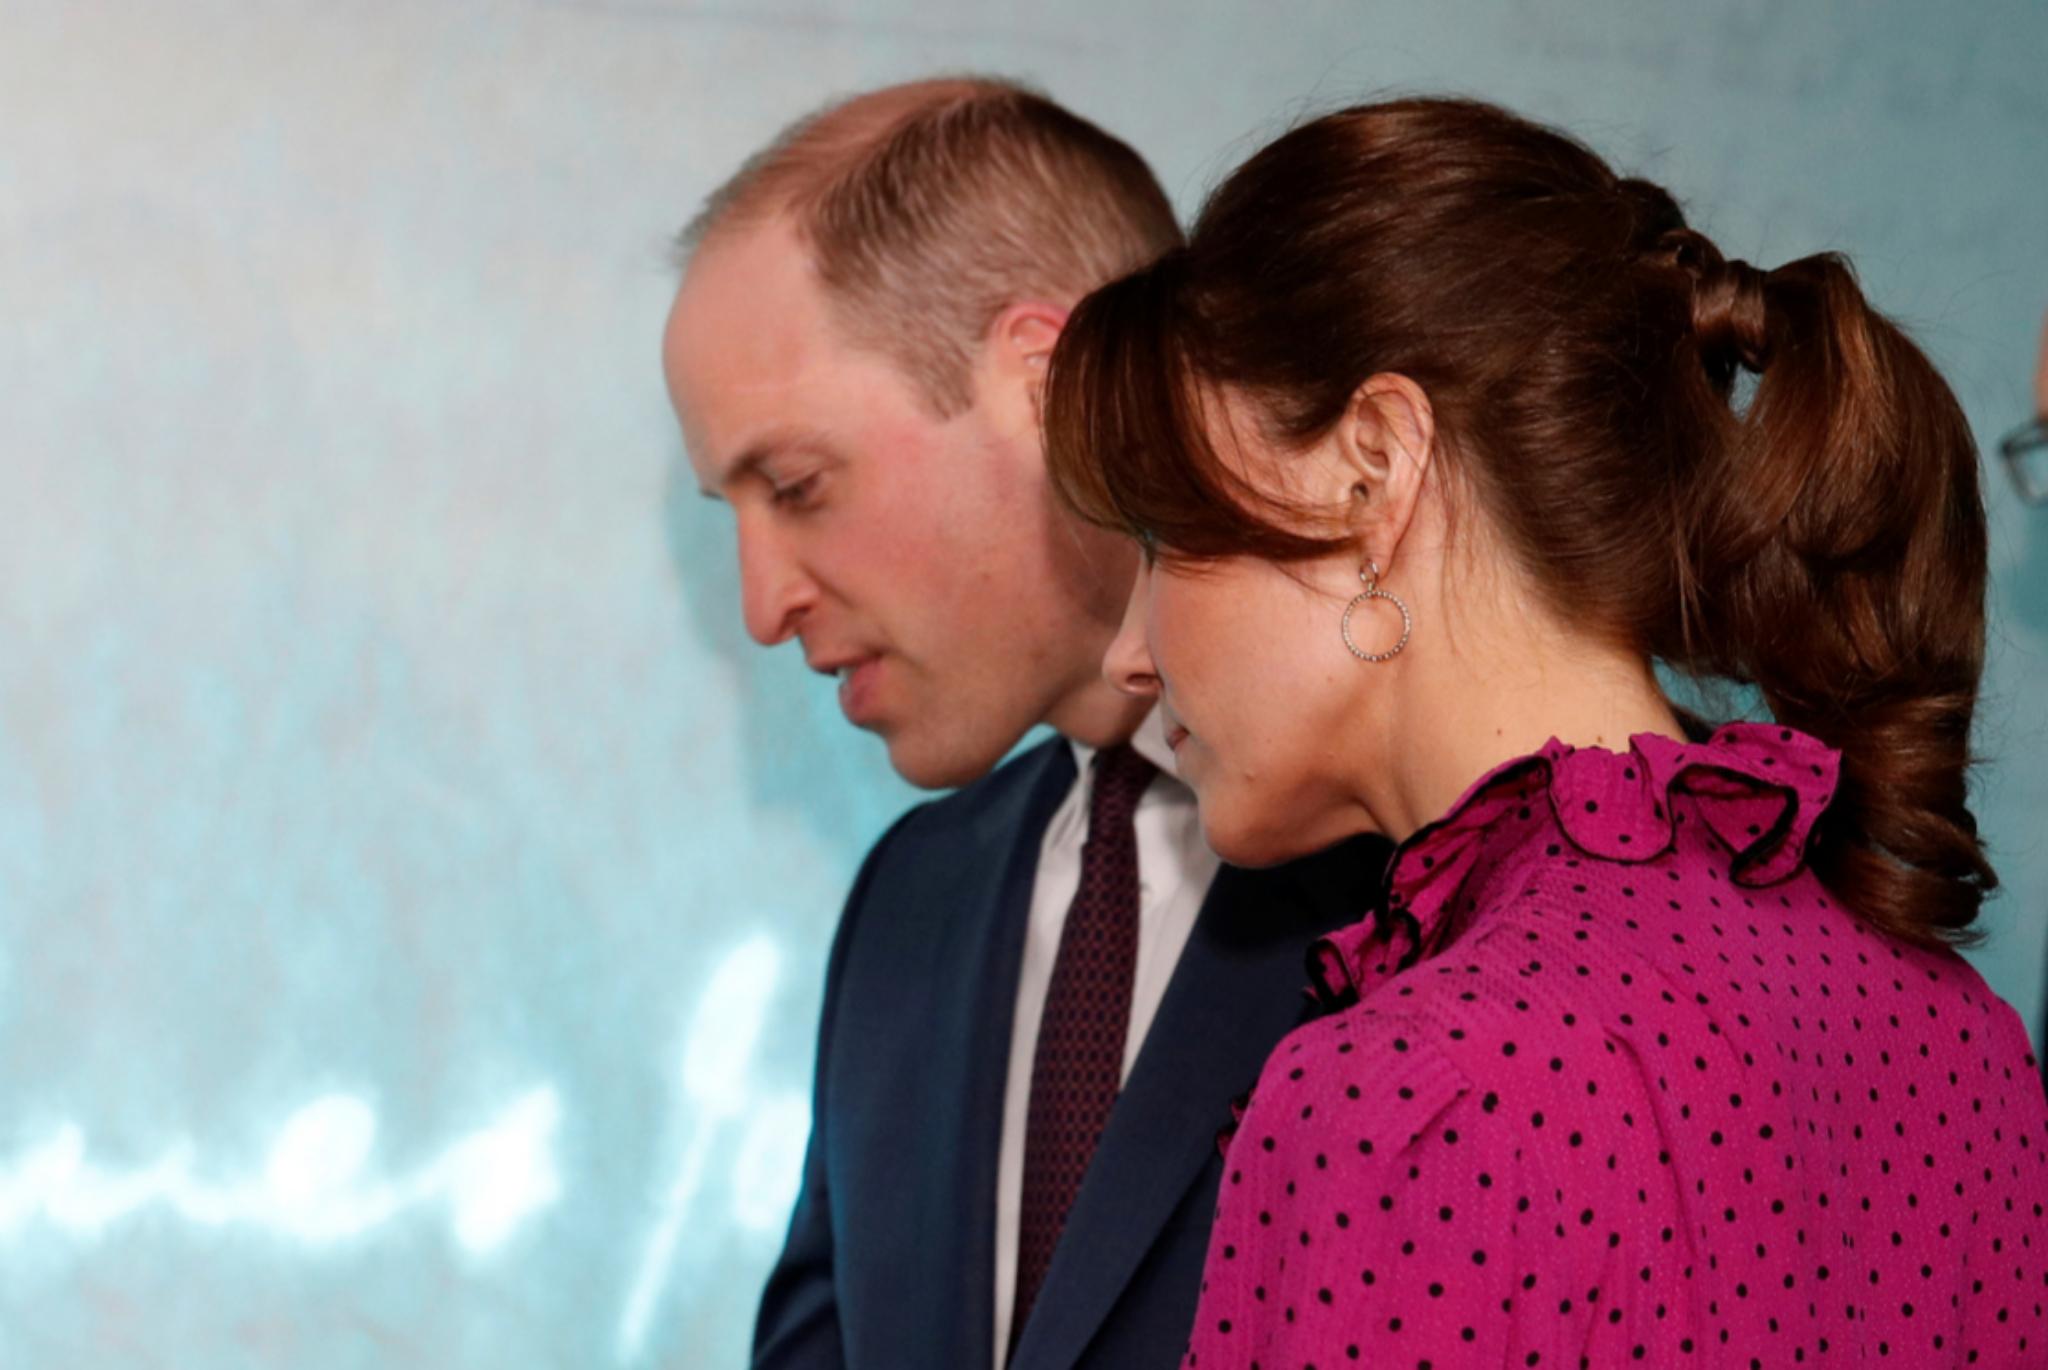 Detalle del recogido que luce Kate Middleton